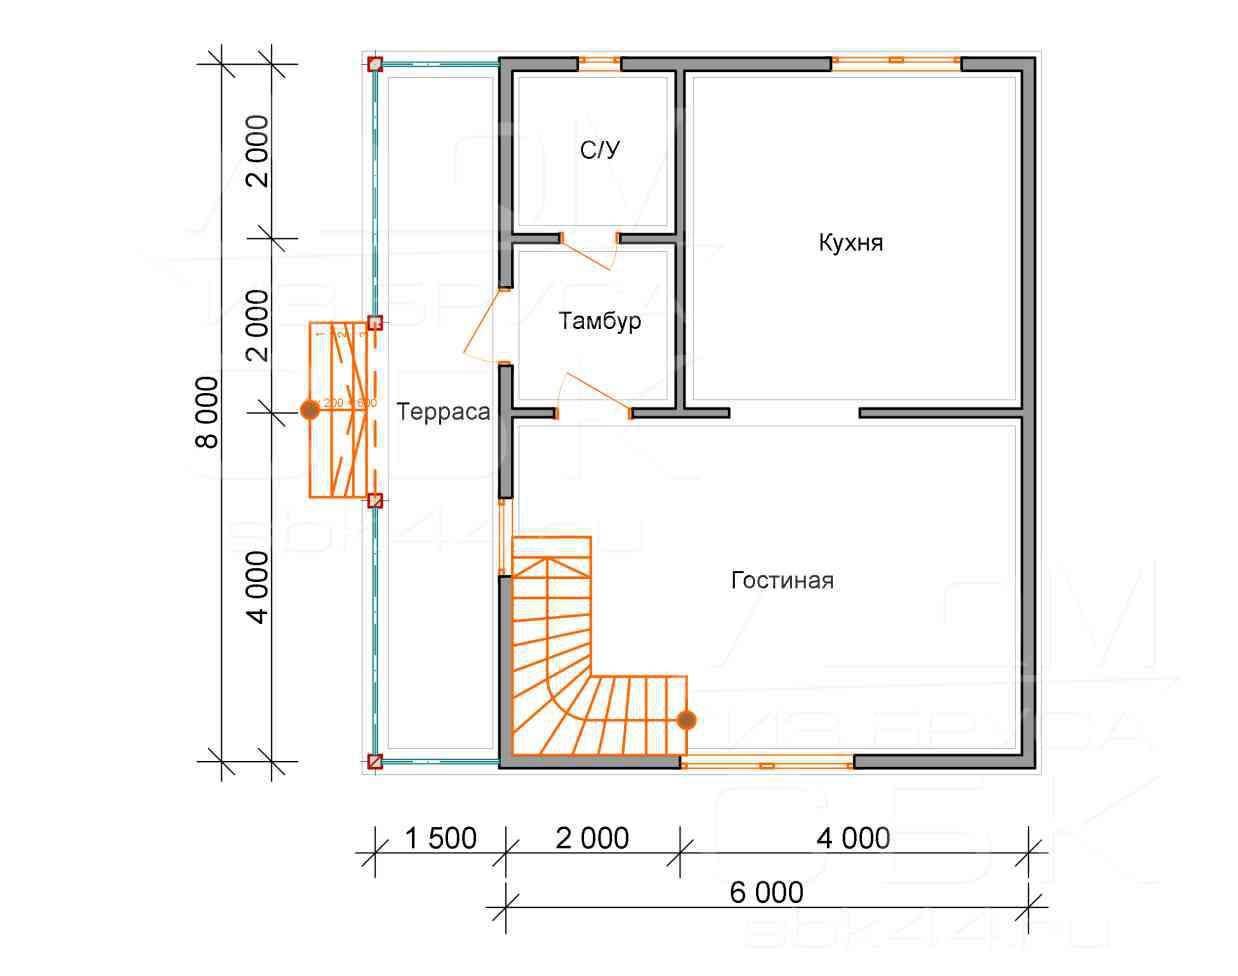 Проект дома из бруса 6 х 8 м «Борисово» - план 1 этаж